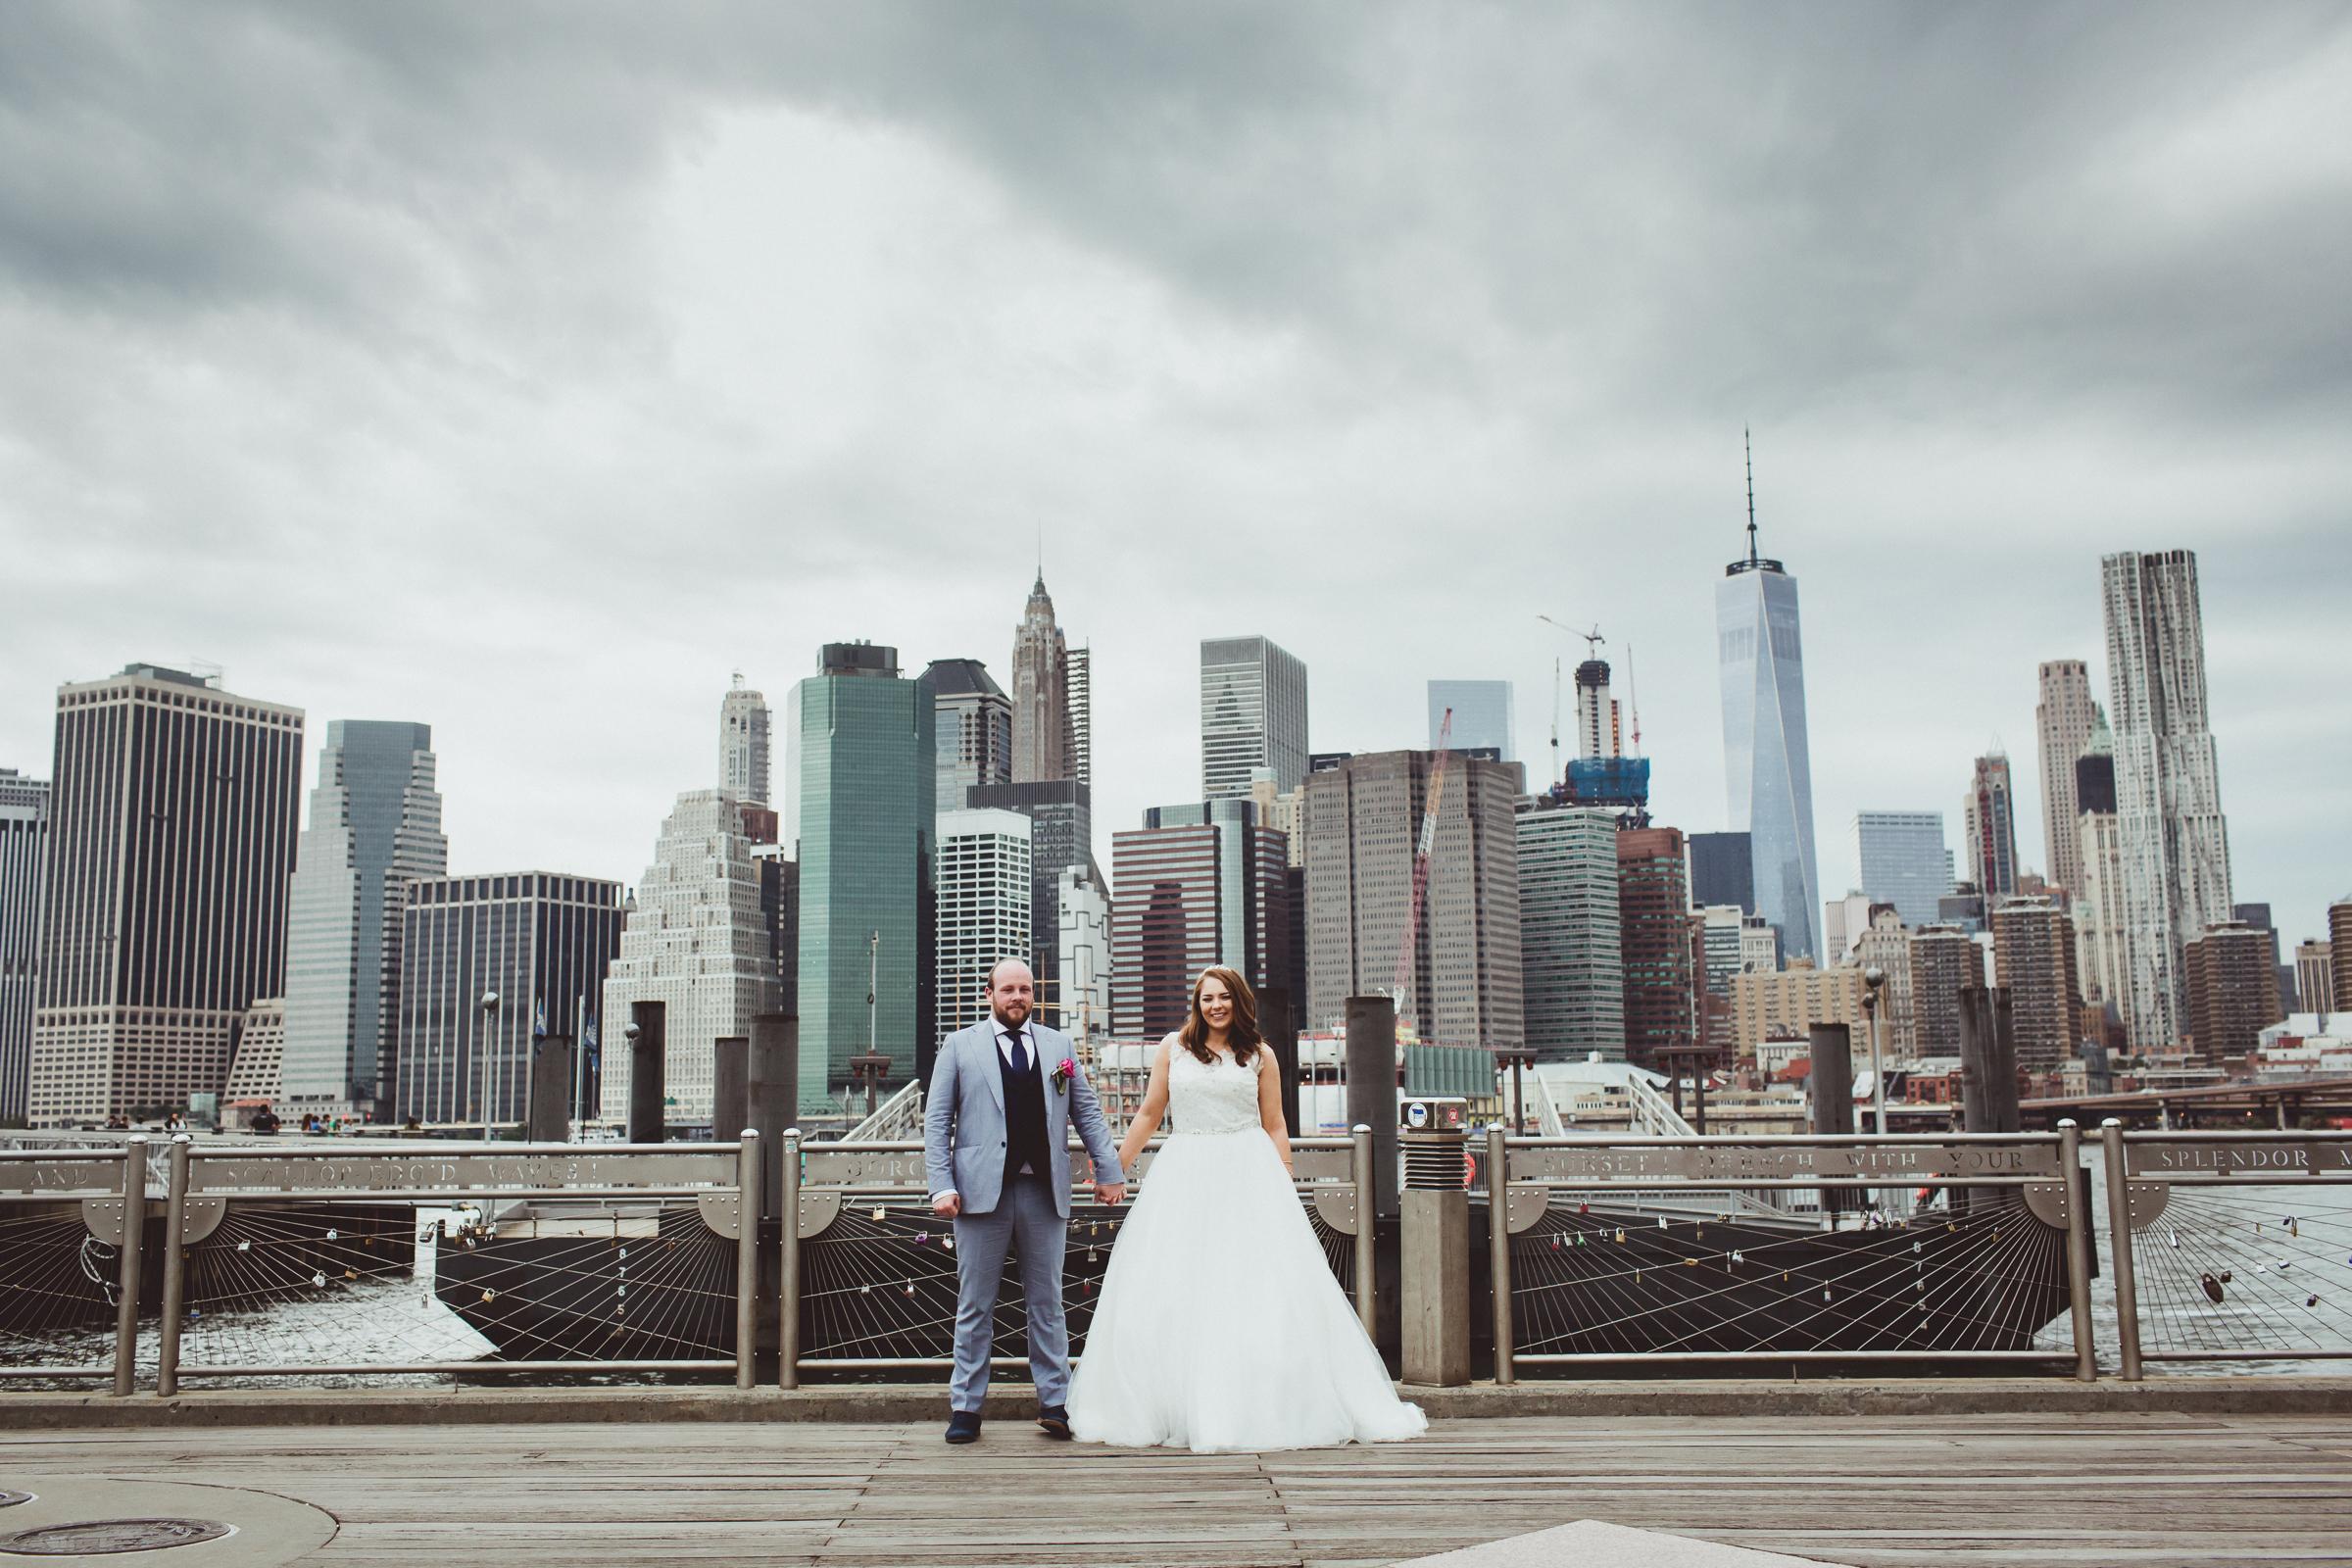 NYC-Central-Park-Elopement-New-York-Documentary-Wedding-Photographer-Dumbo-Brooklyn-Bridge-Park--34.jpg